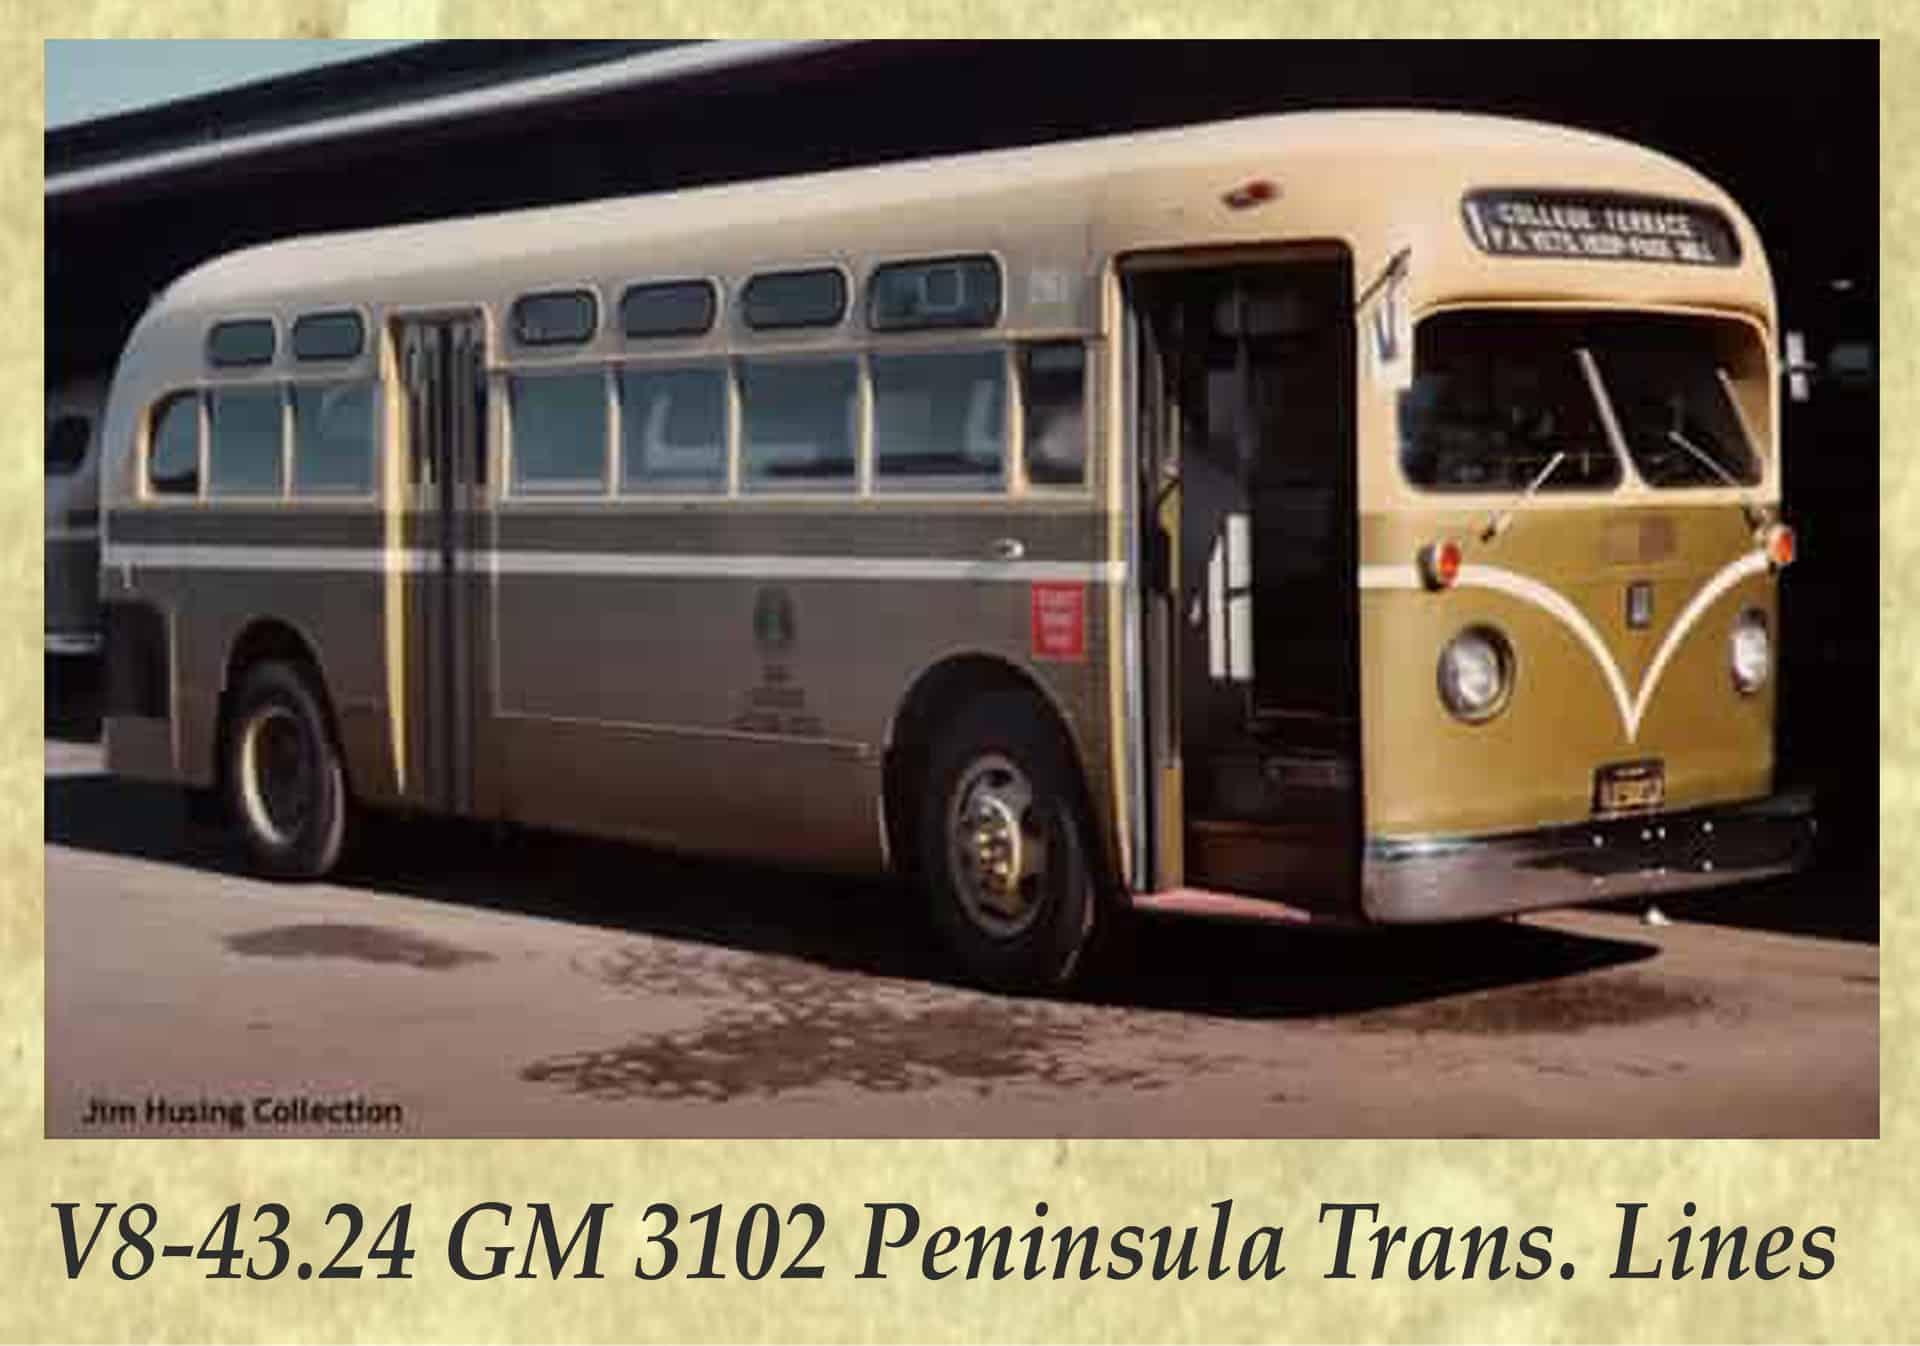 V8-43.24 GM 3102 Peninsula Trans. Lines